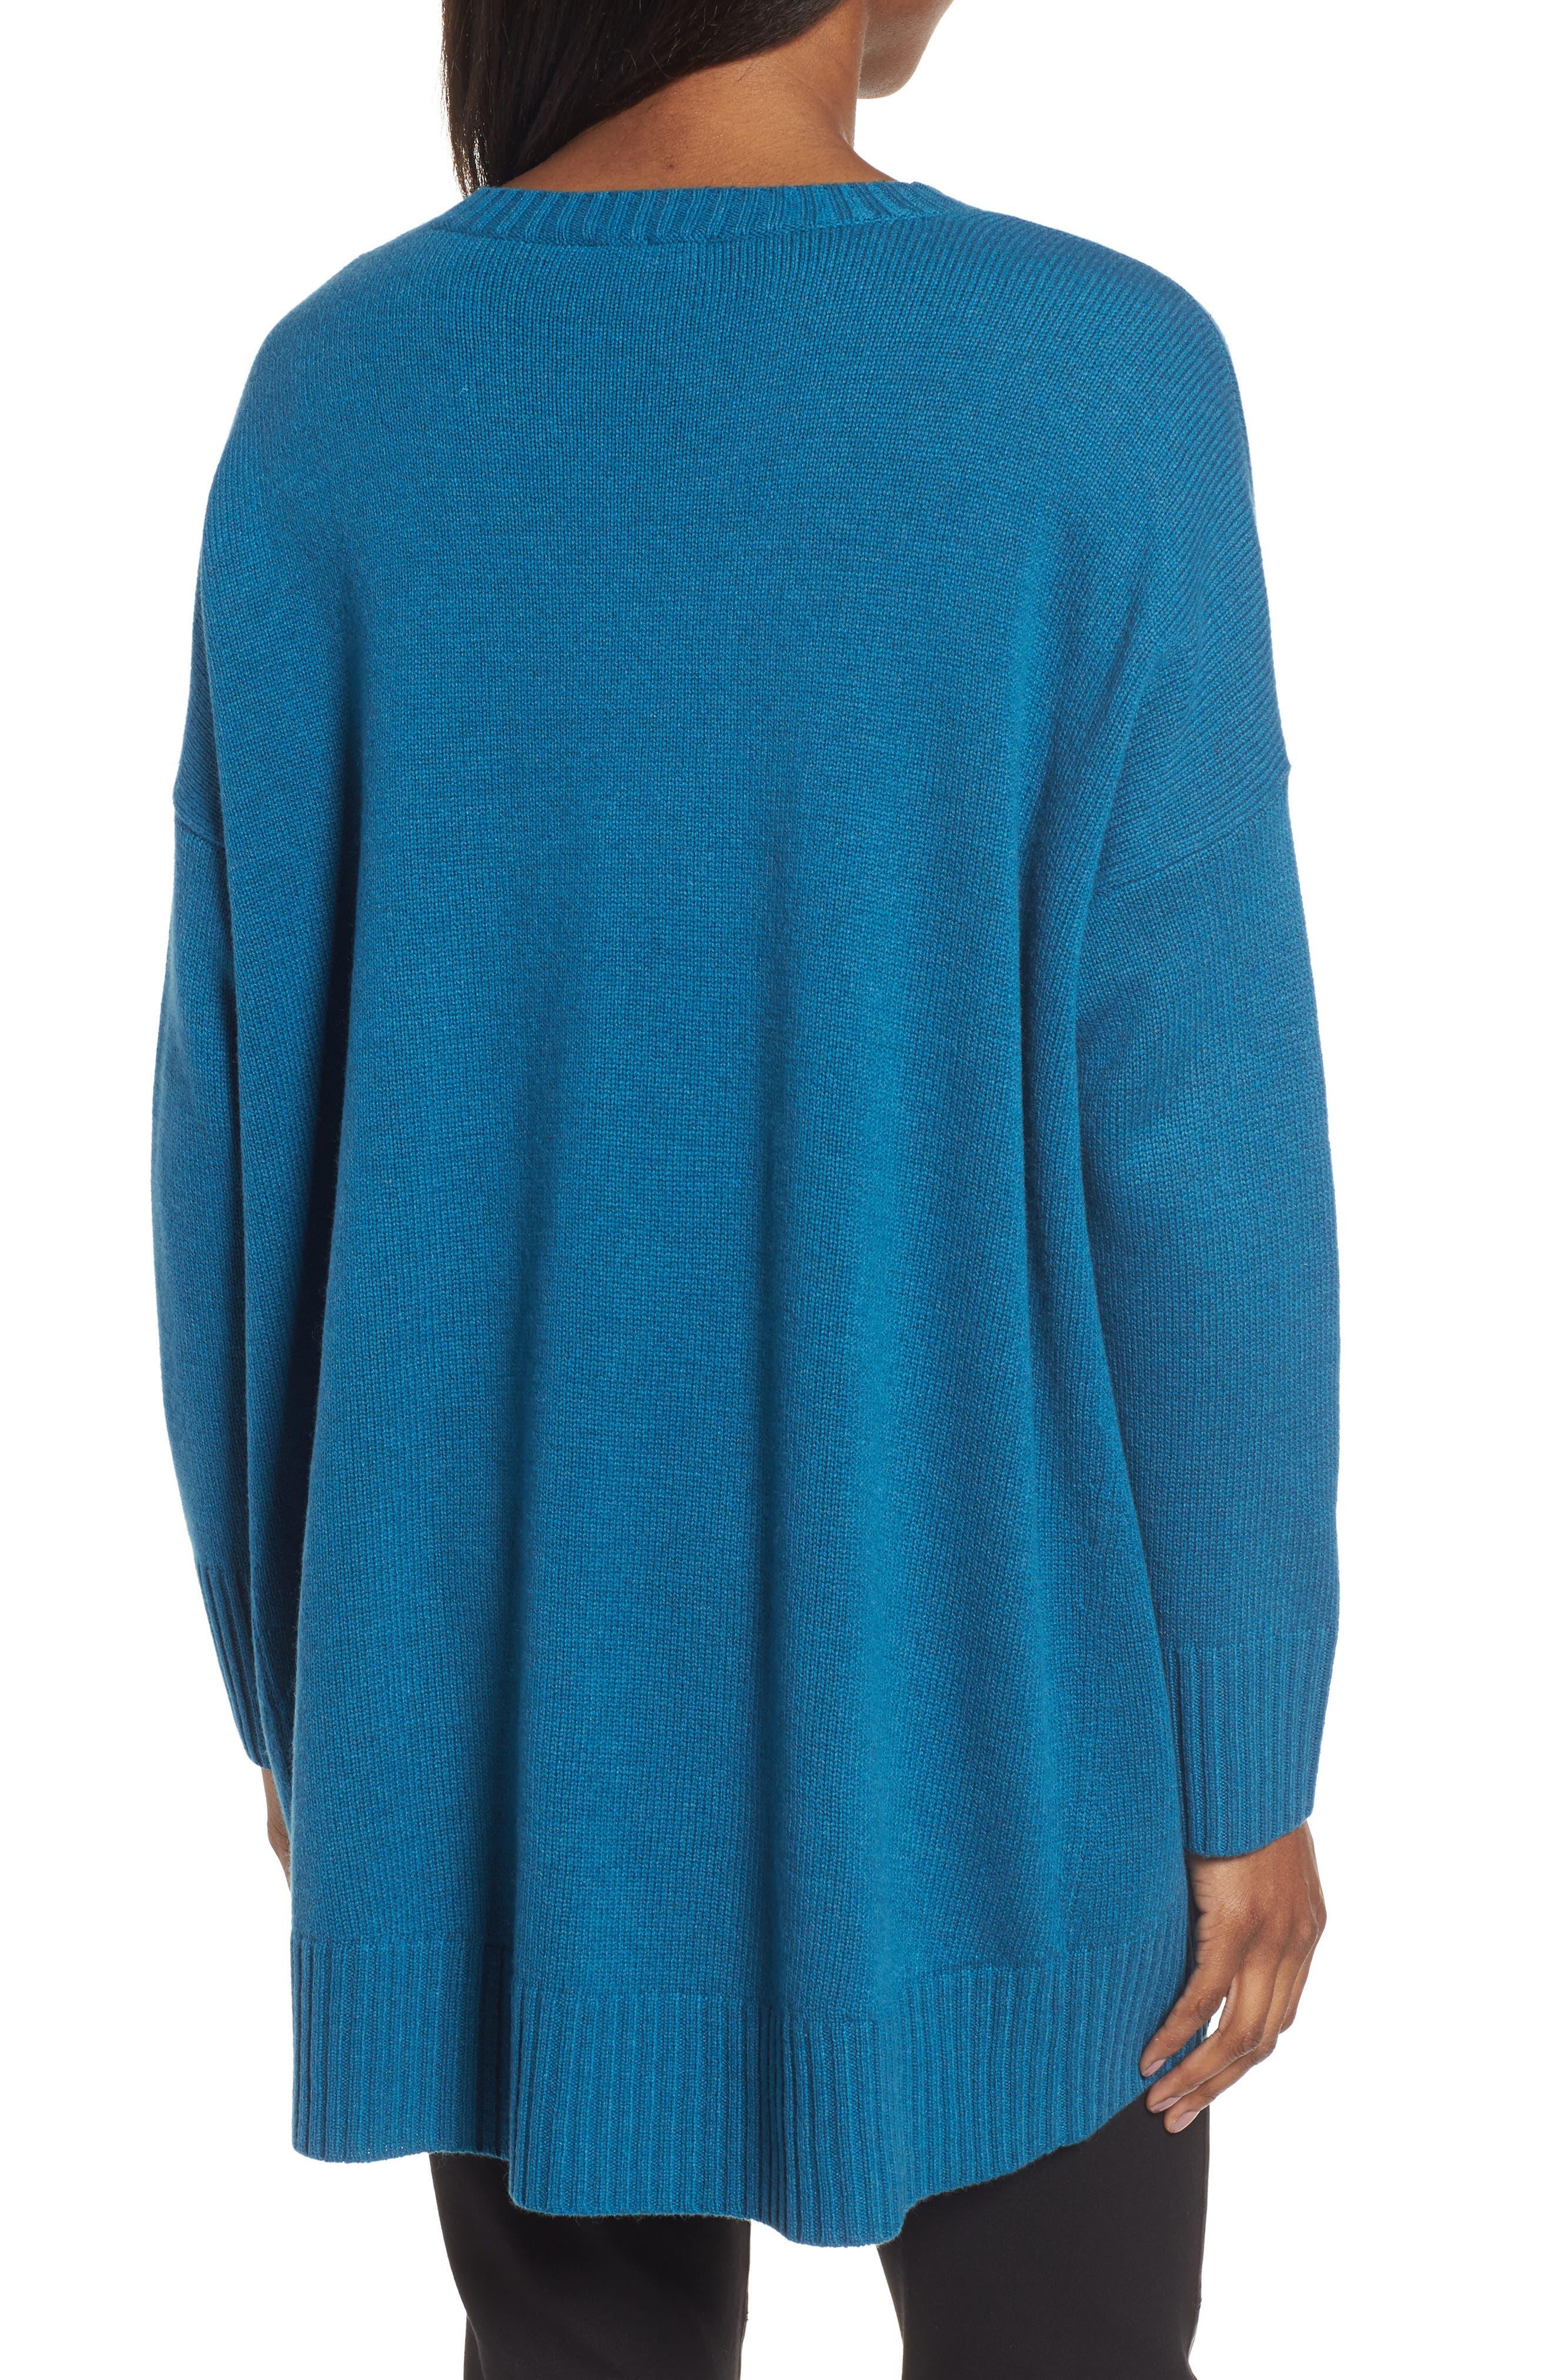 Alternate Image 2  - Eileen Fisher Cashmere & Wool Blend Oversize Sweater